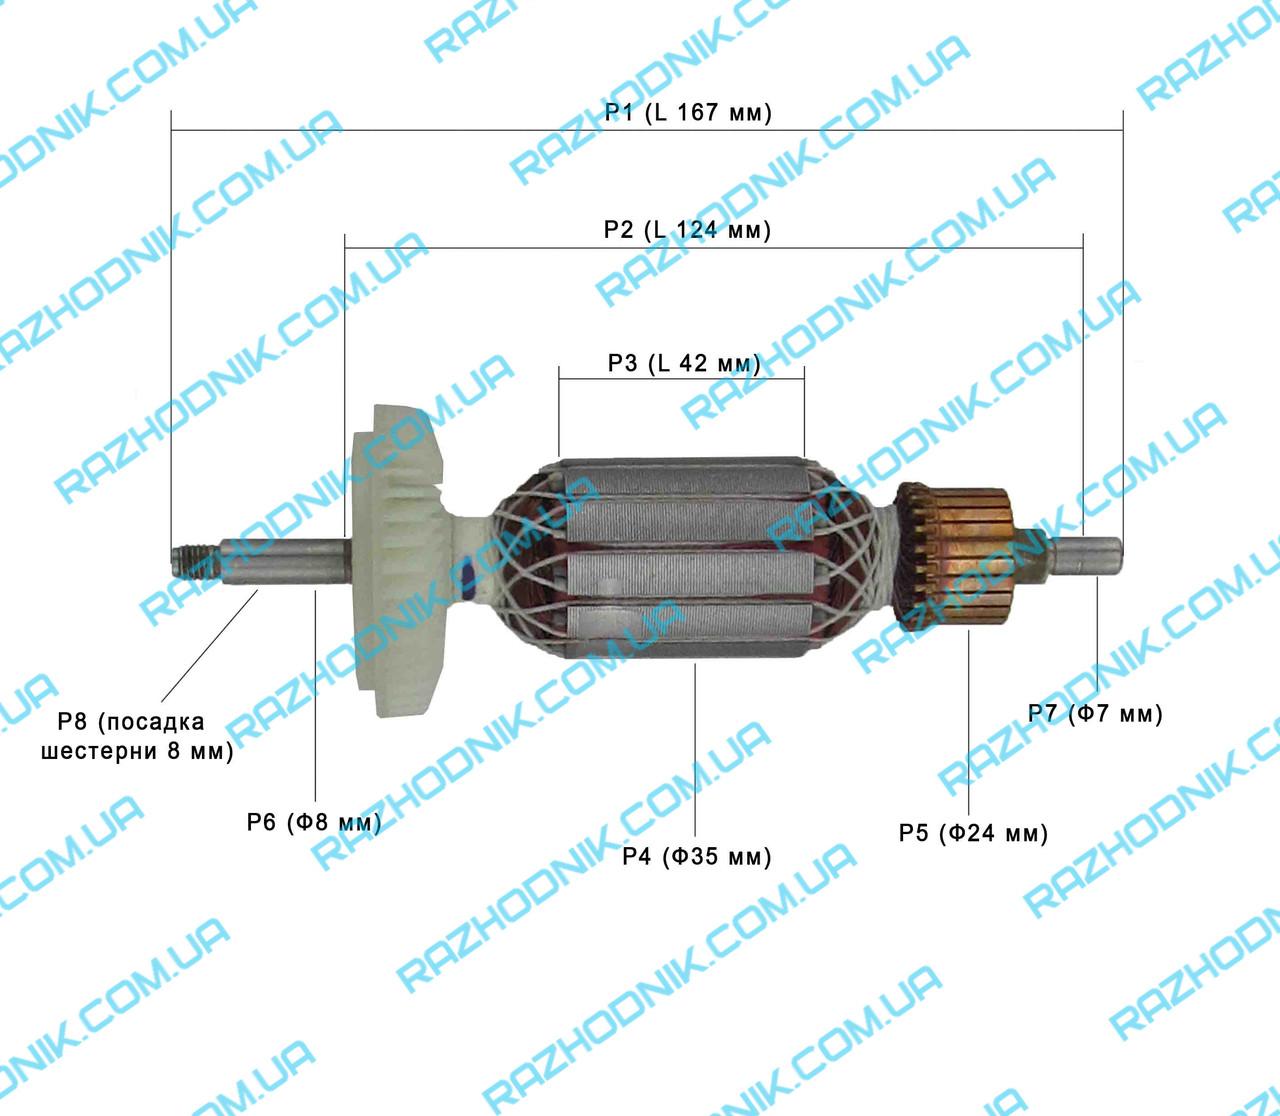 Якорь на болгарку Bosch GWS 11-125 (Аналог)